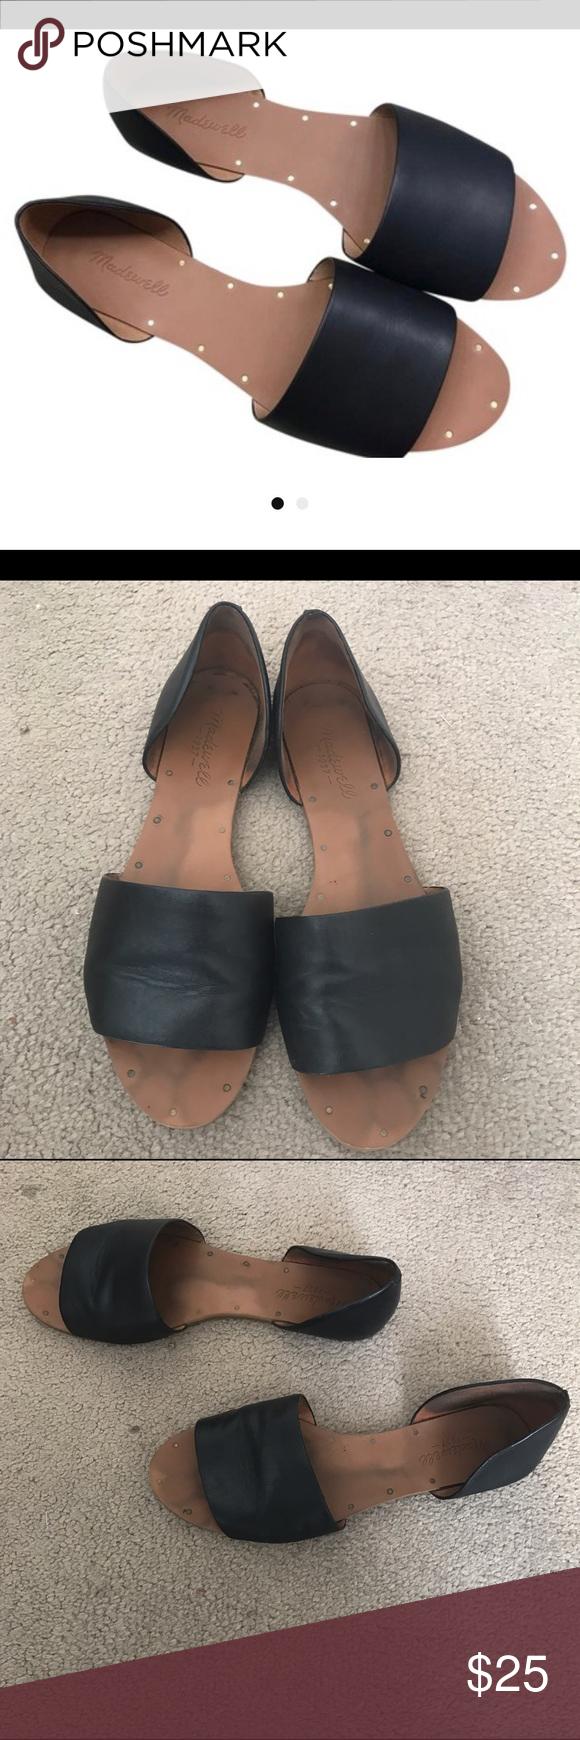 MM6 Maison Martin Margiela Designer Shoes Black Leather